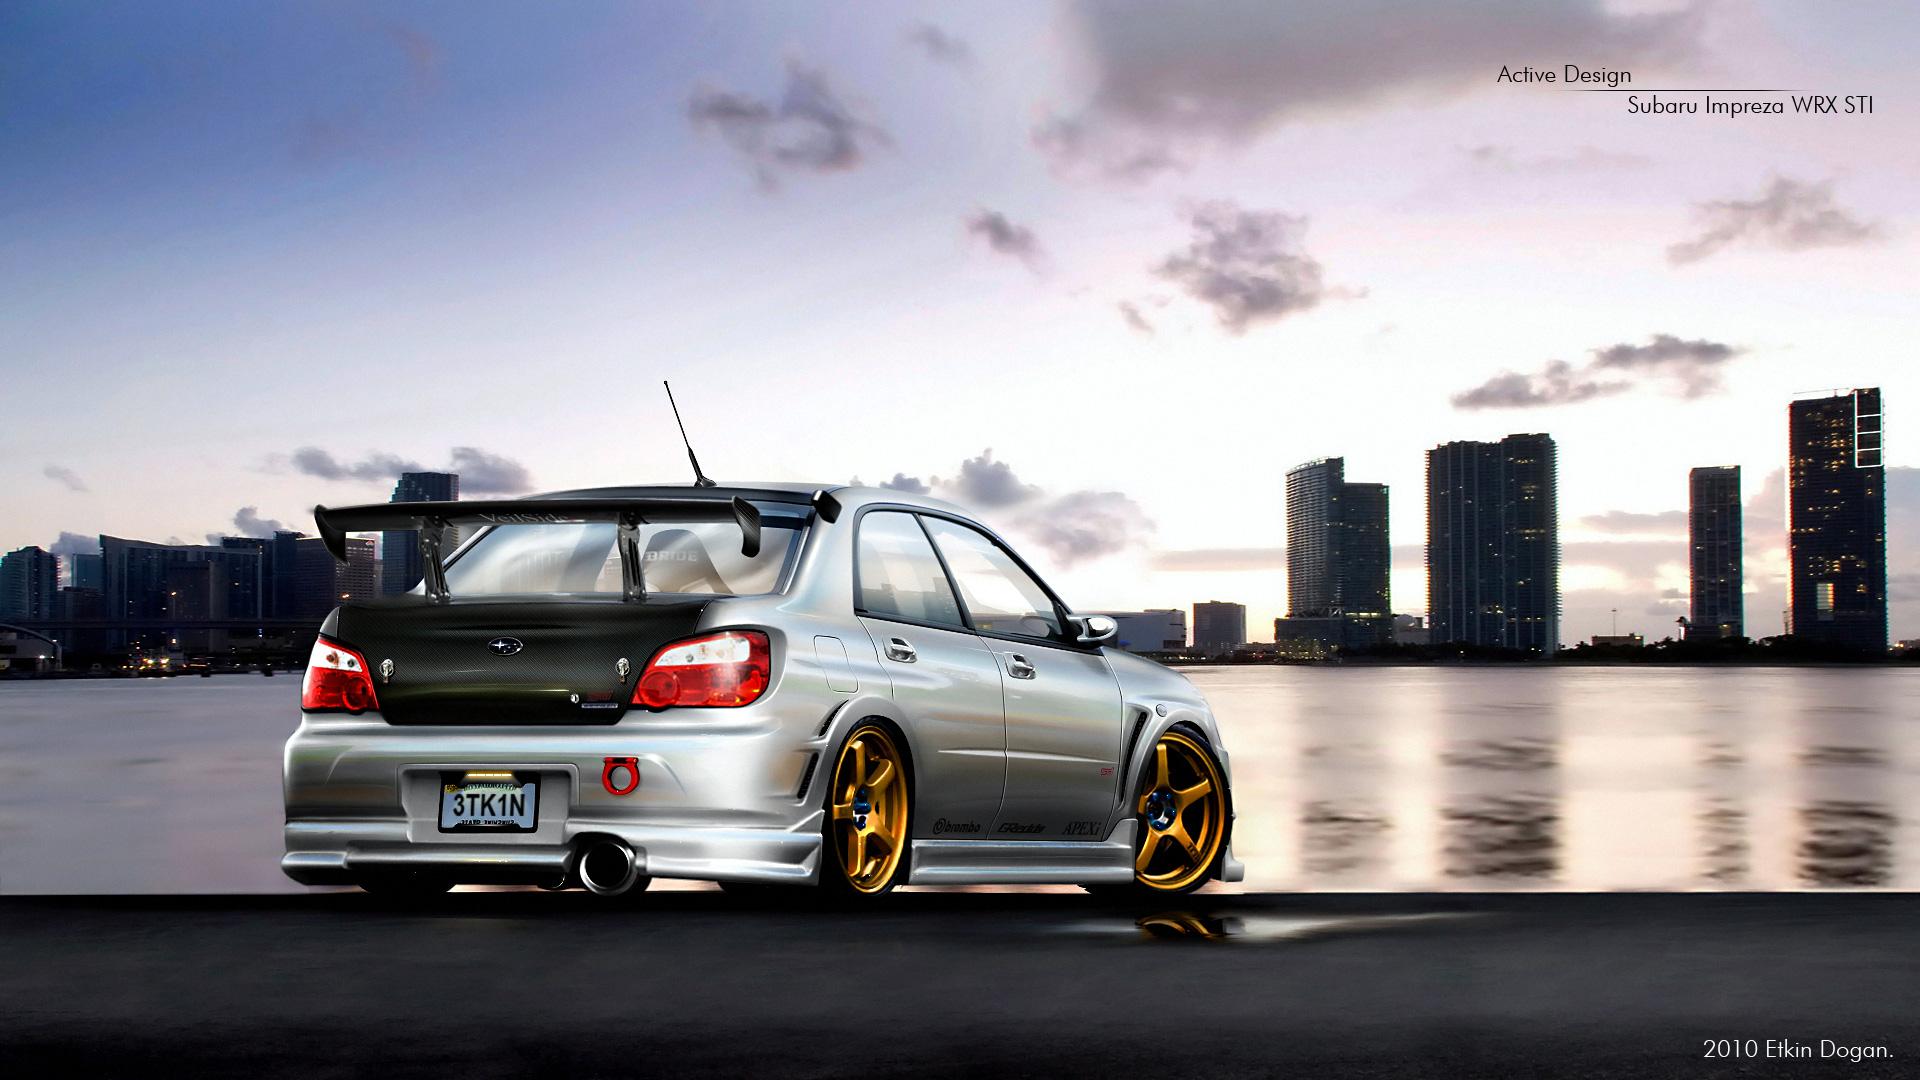 Subaru Impreza WRX STI 2 by Active-Design